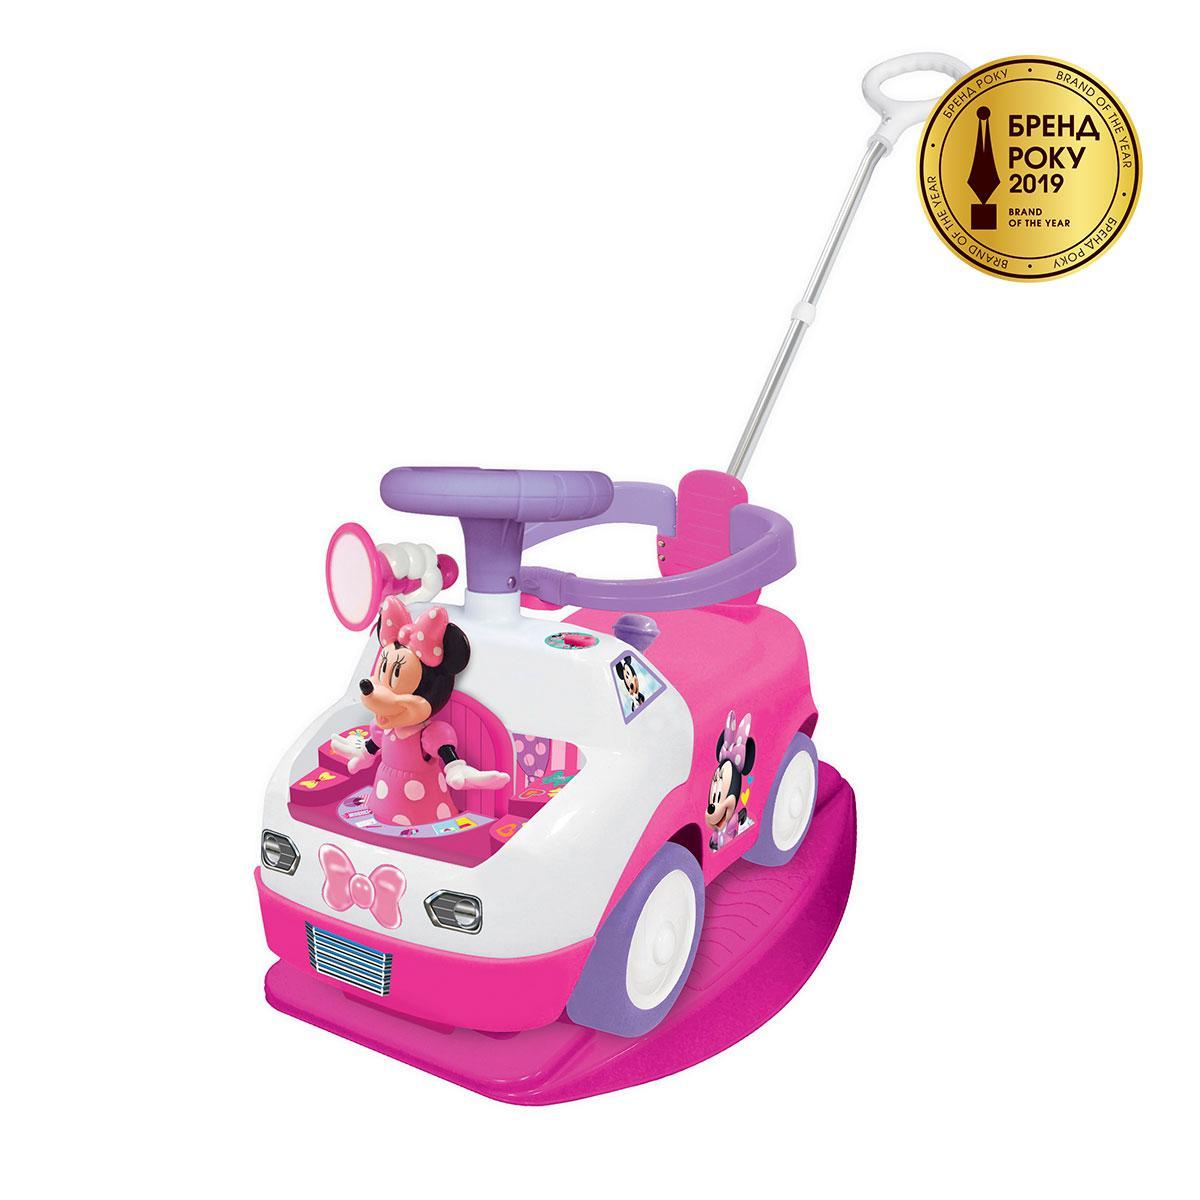 Машинка каталка Чудомобиль- Танцующая Минни: Три В Одном Kiddieland Minnie Dancing Ride On 055749